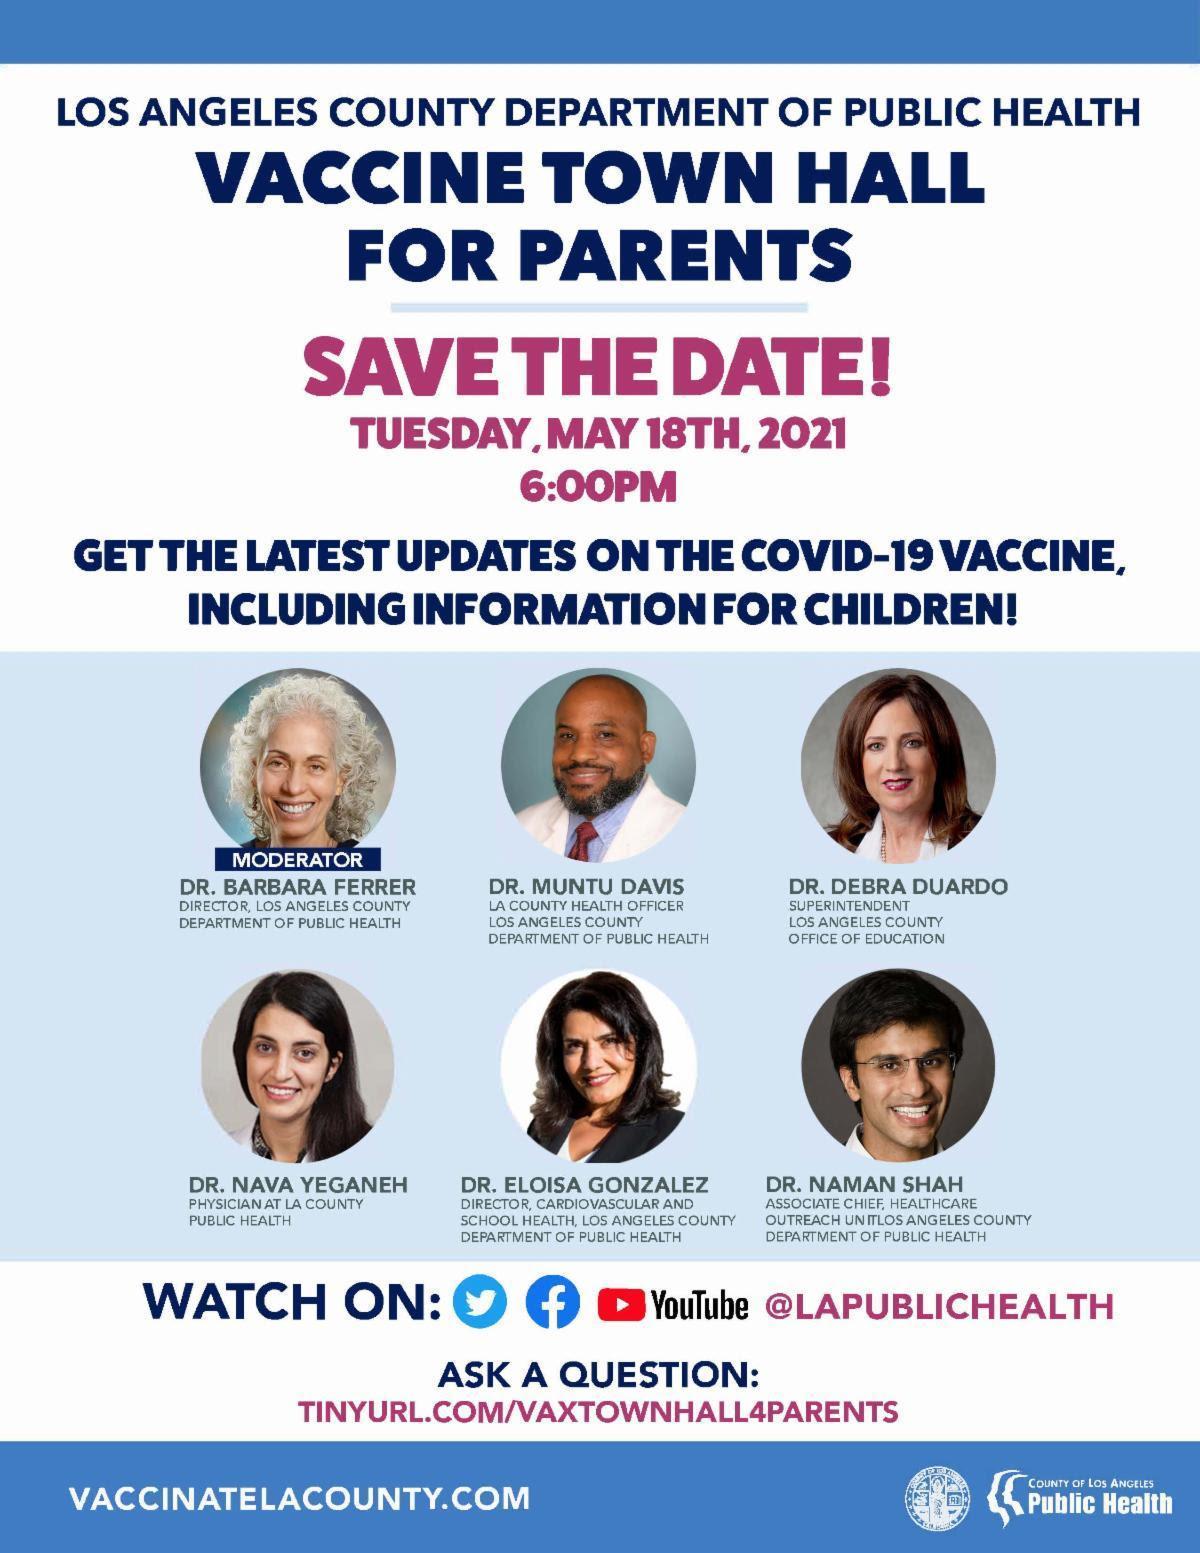 LACDPH Vaccine Town Hall Flyer ENGLISH